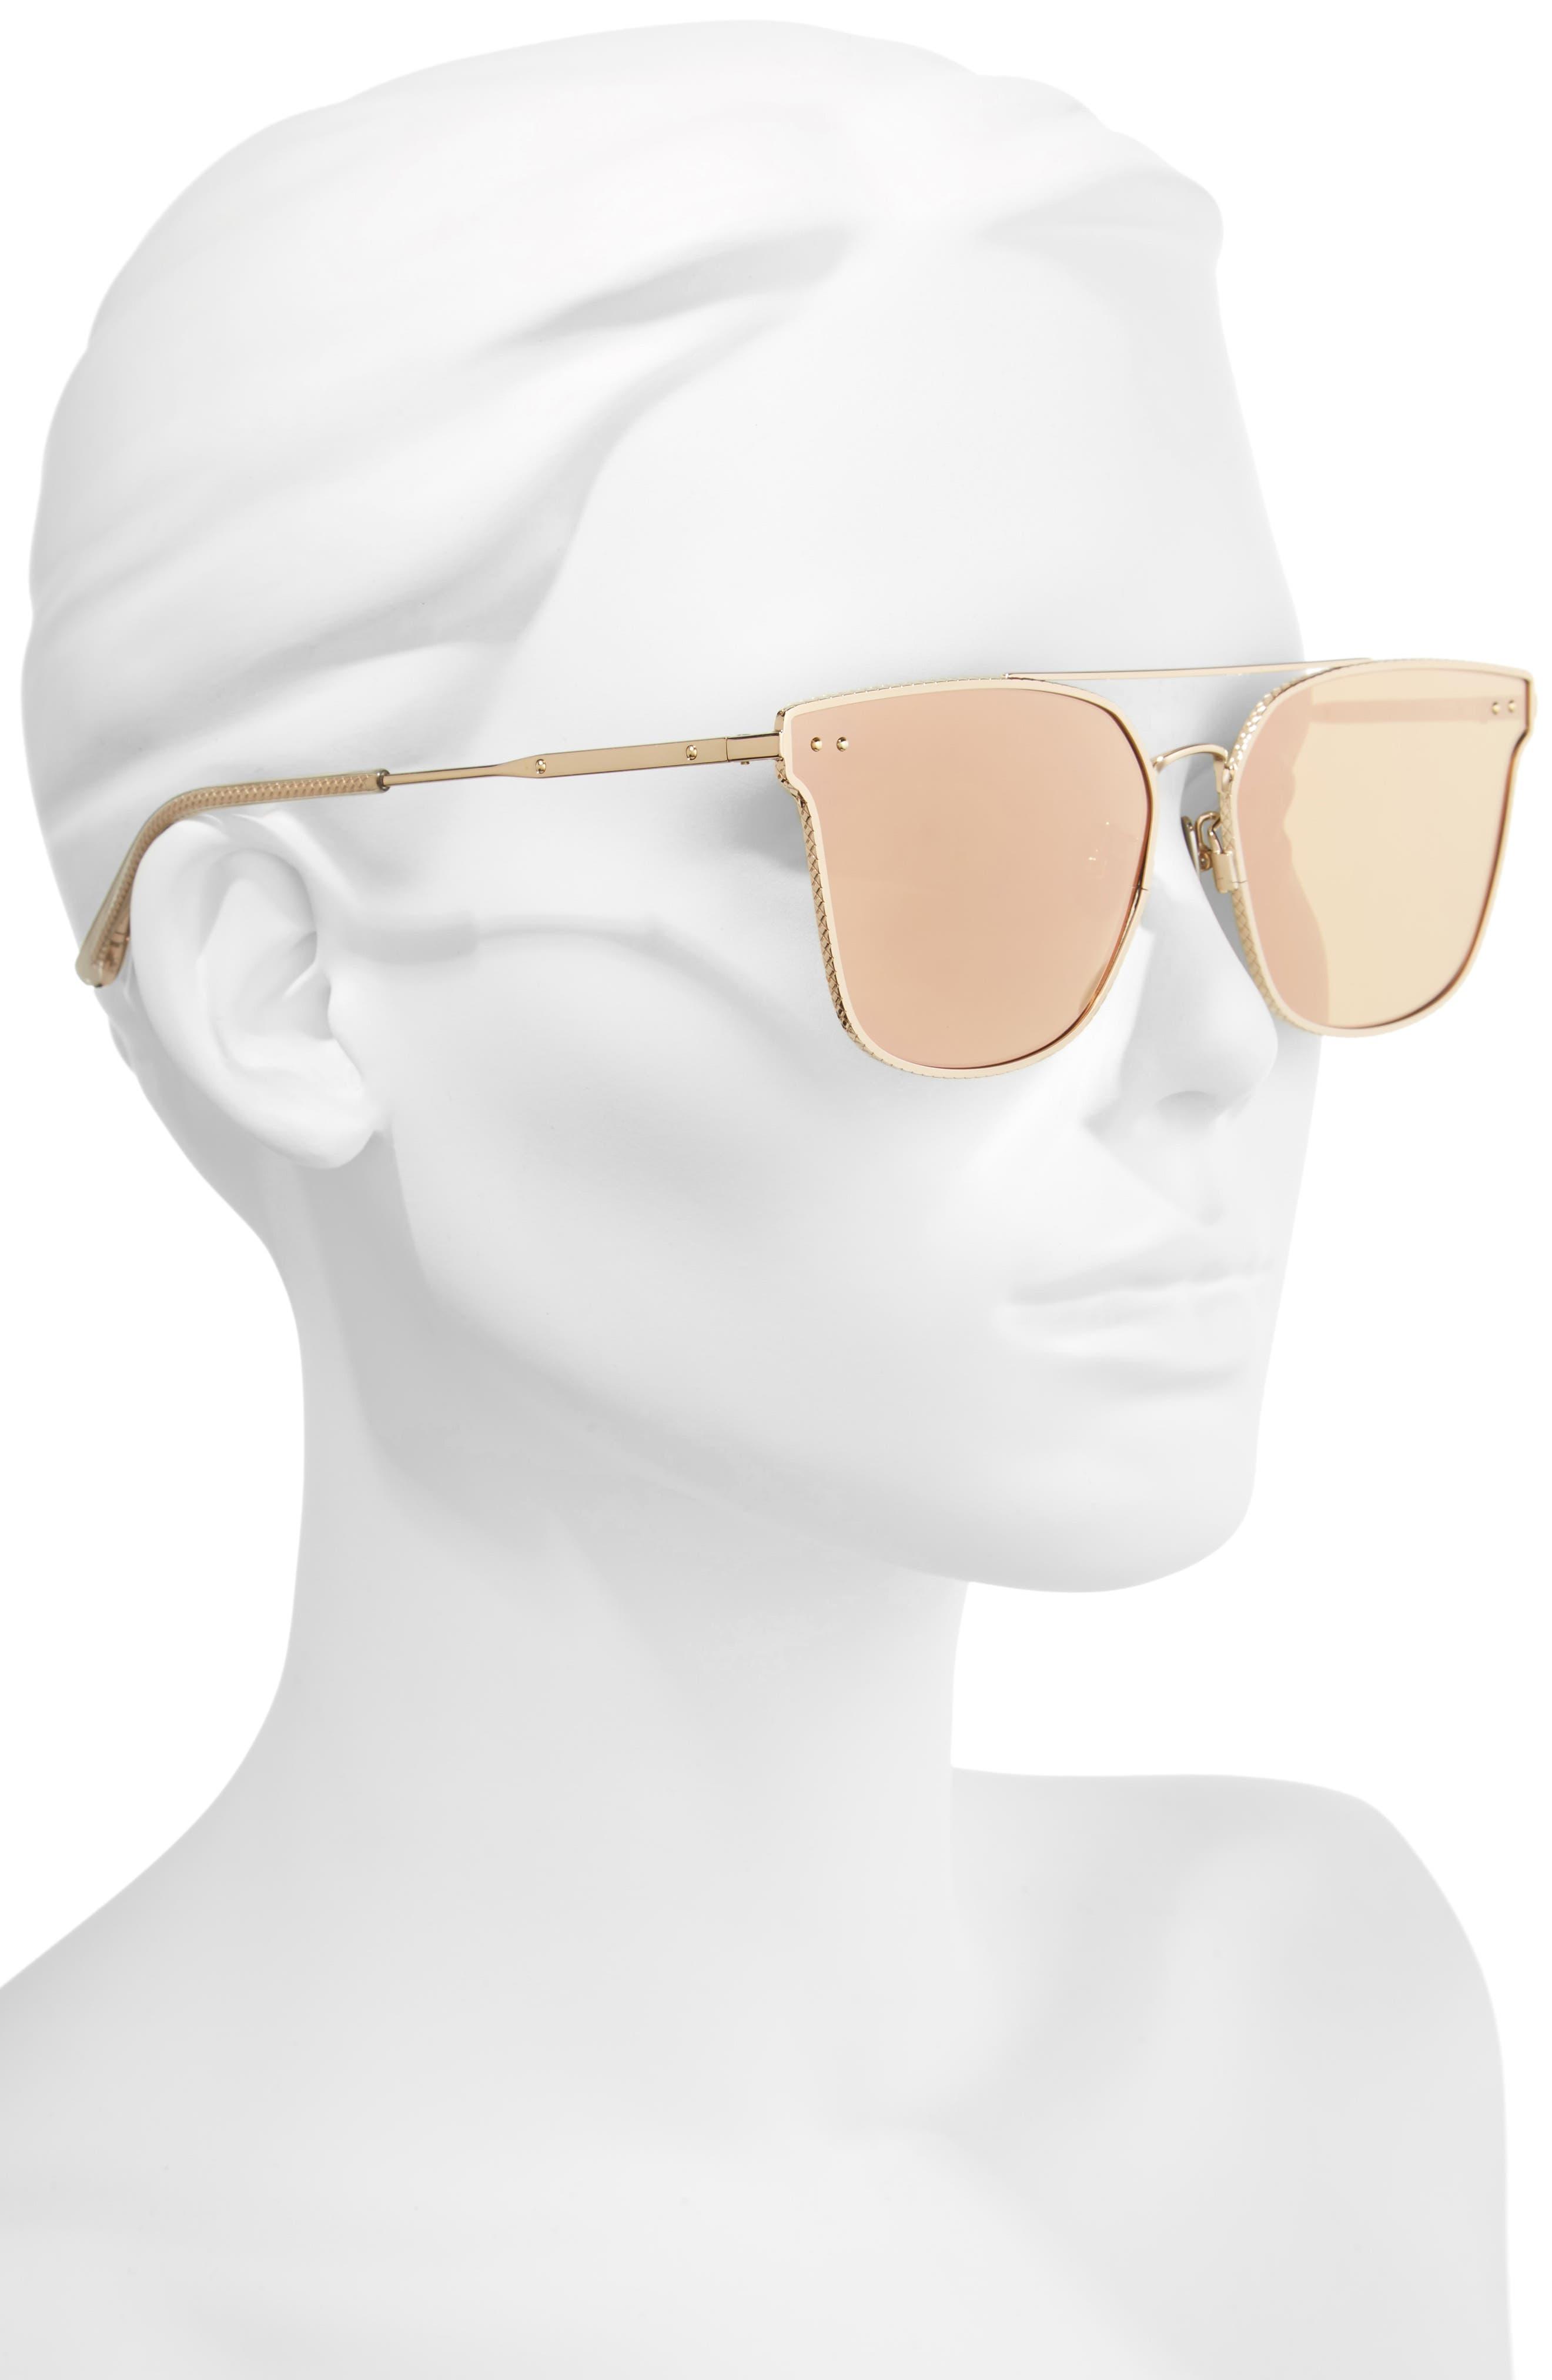 64mm Sunglasses,                             Alternate thumbnail 2, color,                             Gold